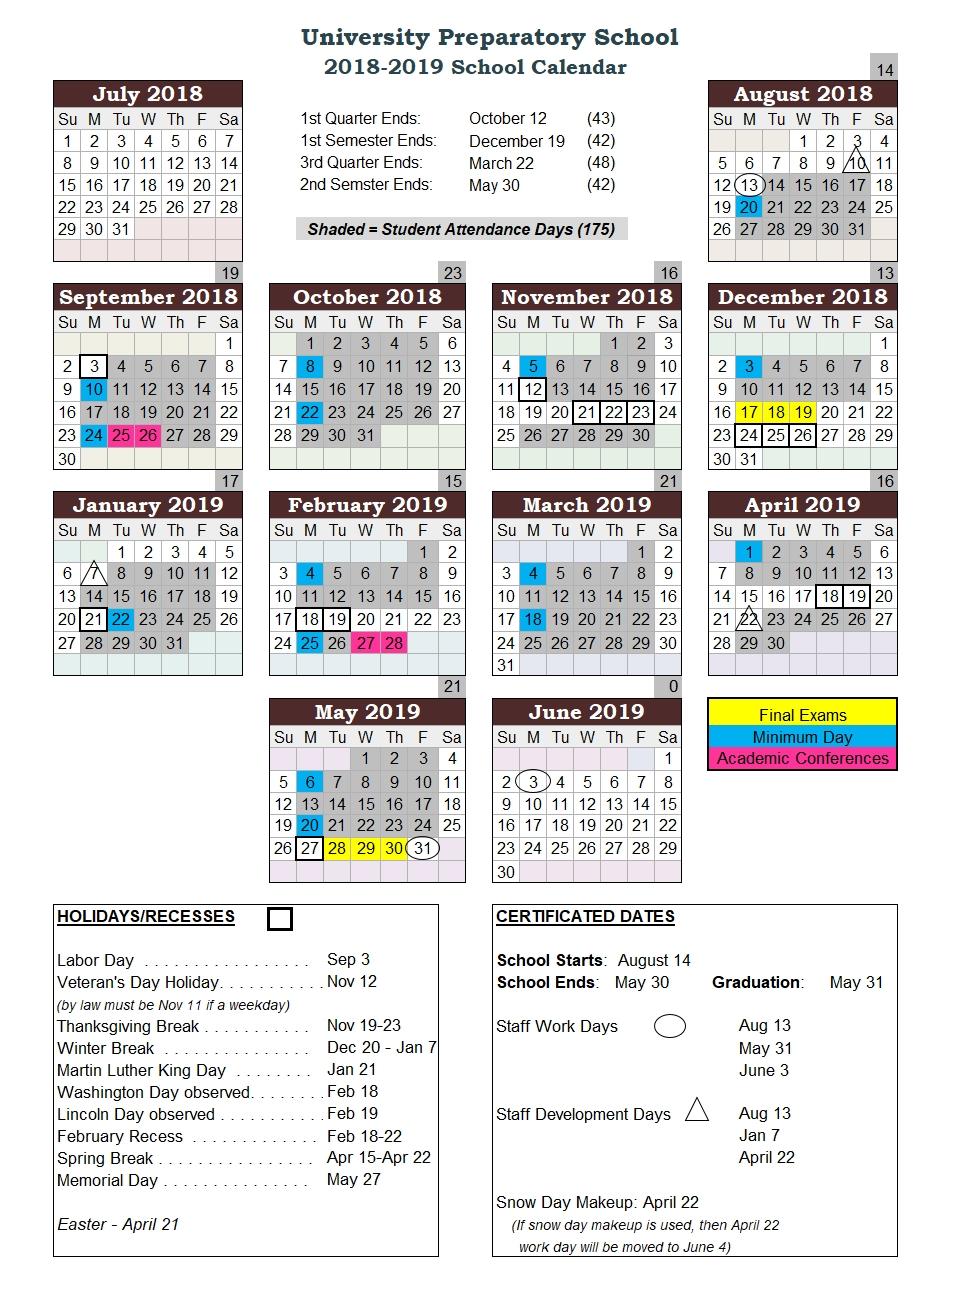 School Calendar U Of H Calendar 2019